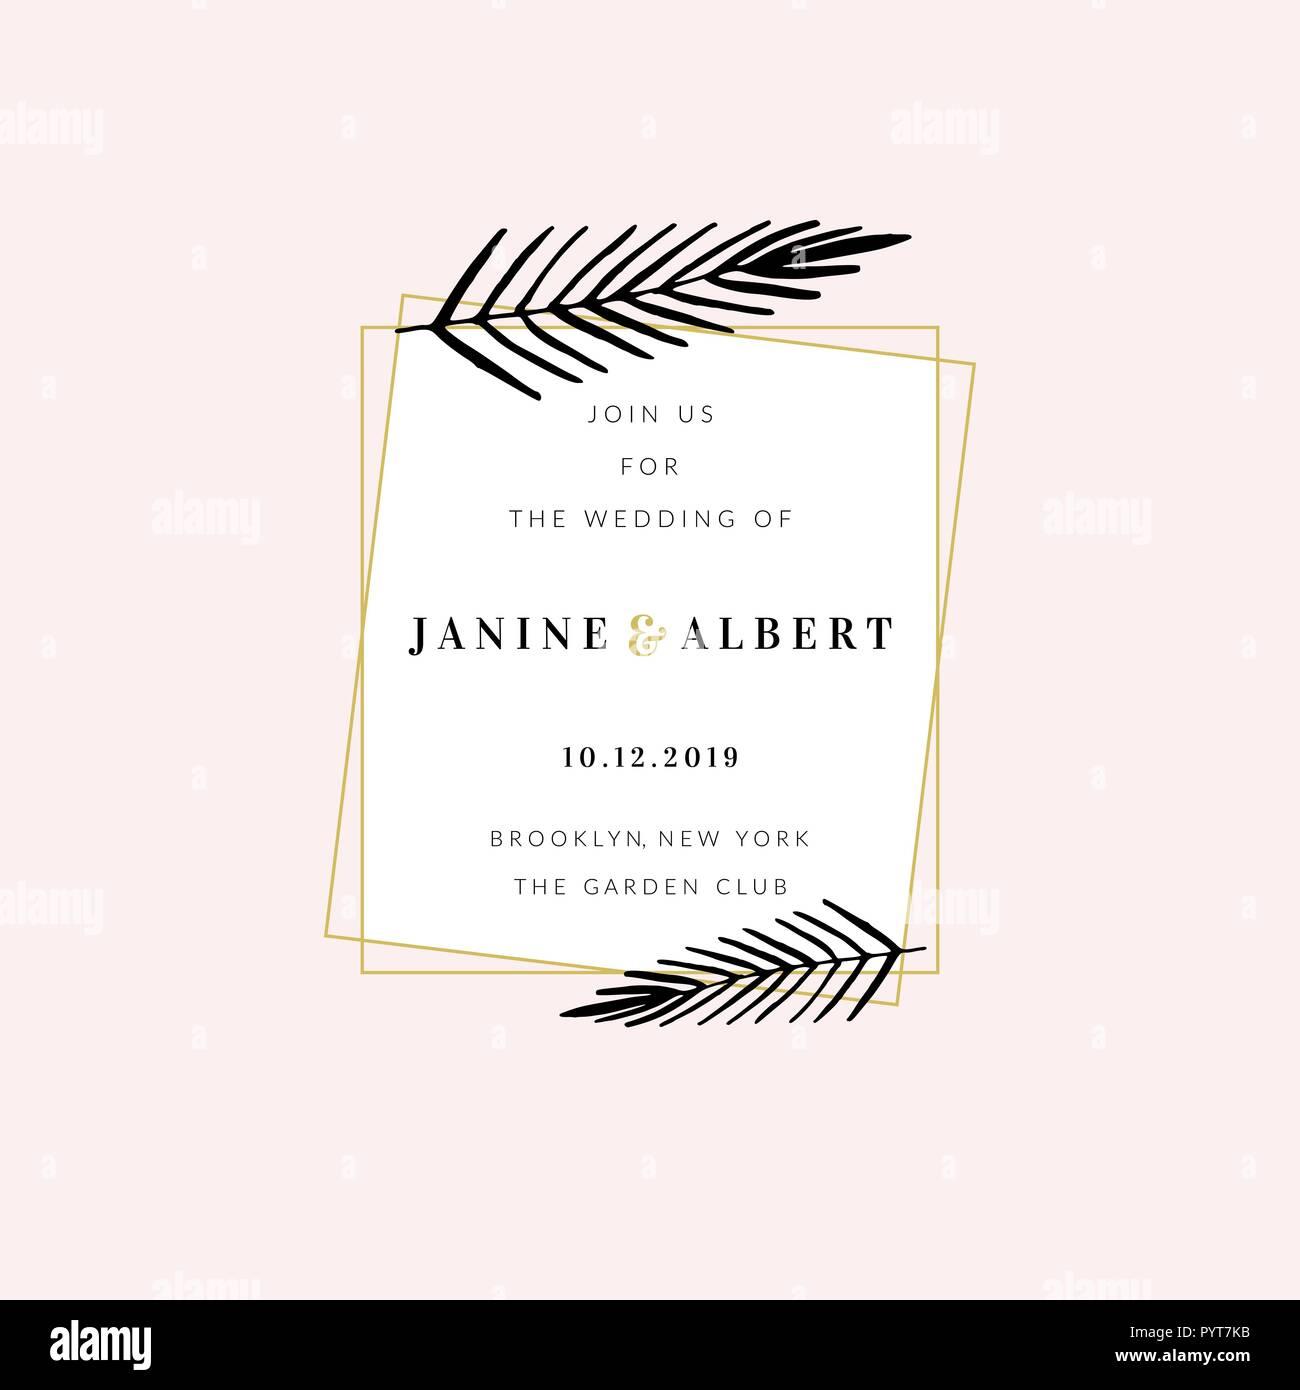 Wedding Invitation Design Template With Golden Geometric Frame